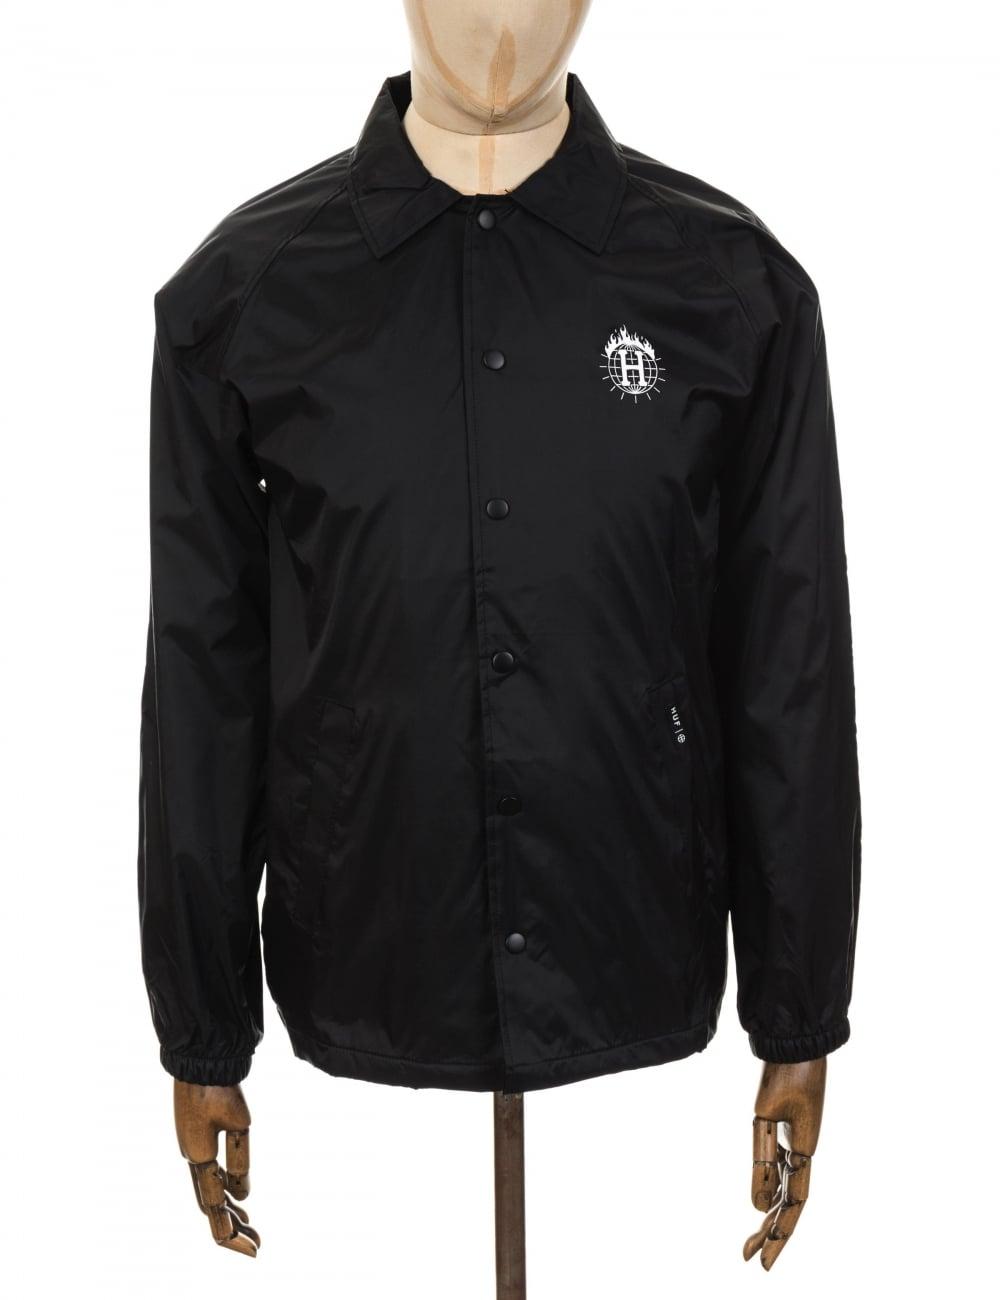 afd9c0aeef8d Huf x Thrasher TDS Coach Jacket - Black - Clothing from Fat Buddha ...